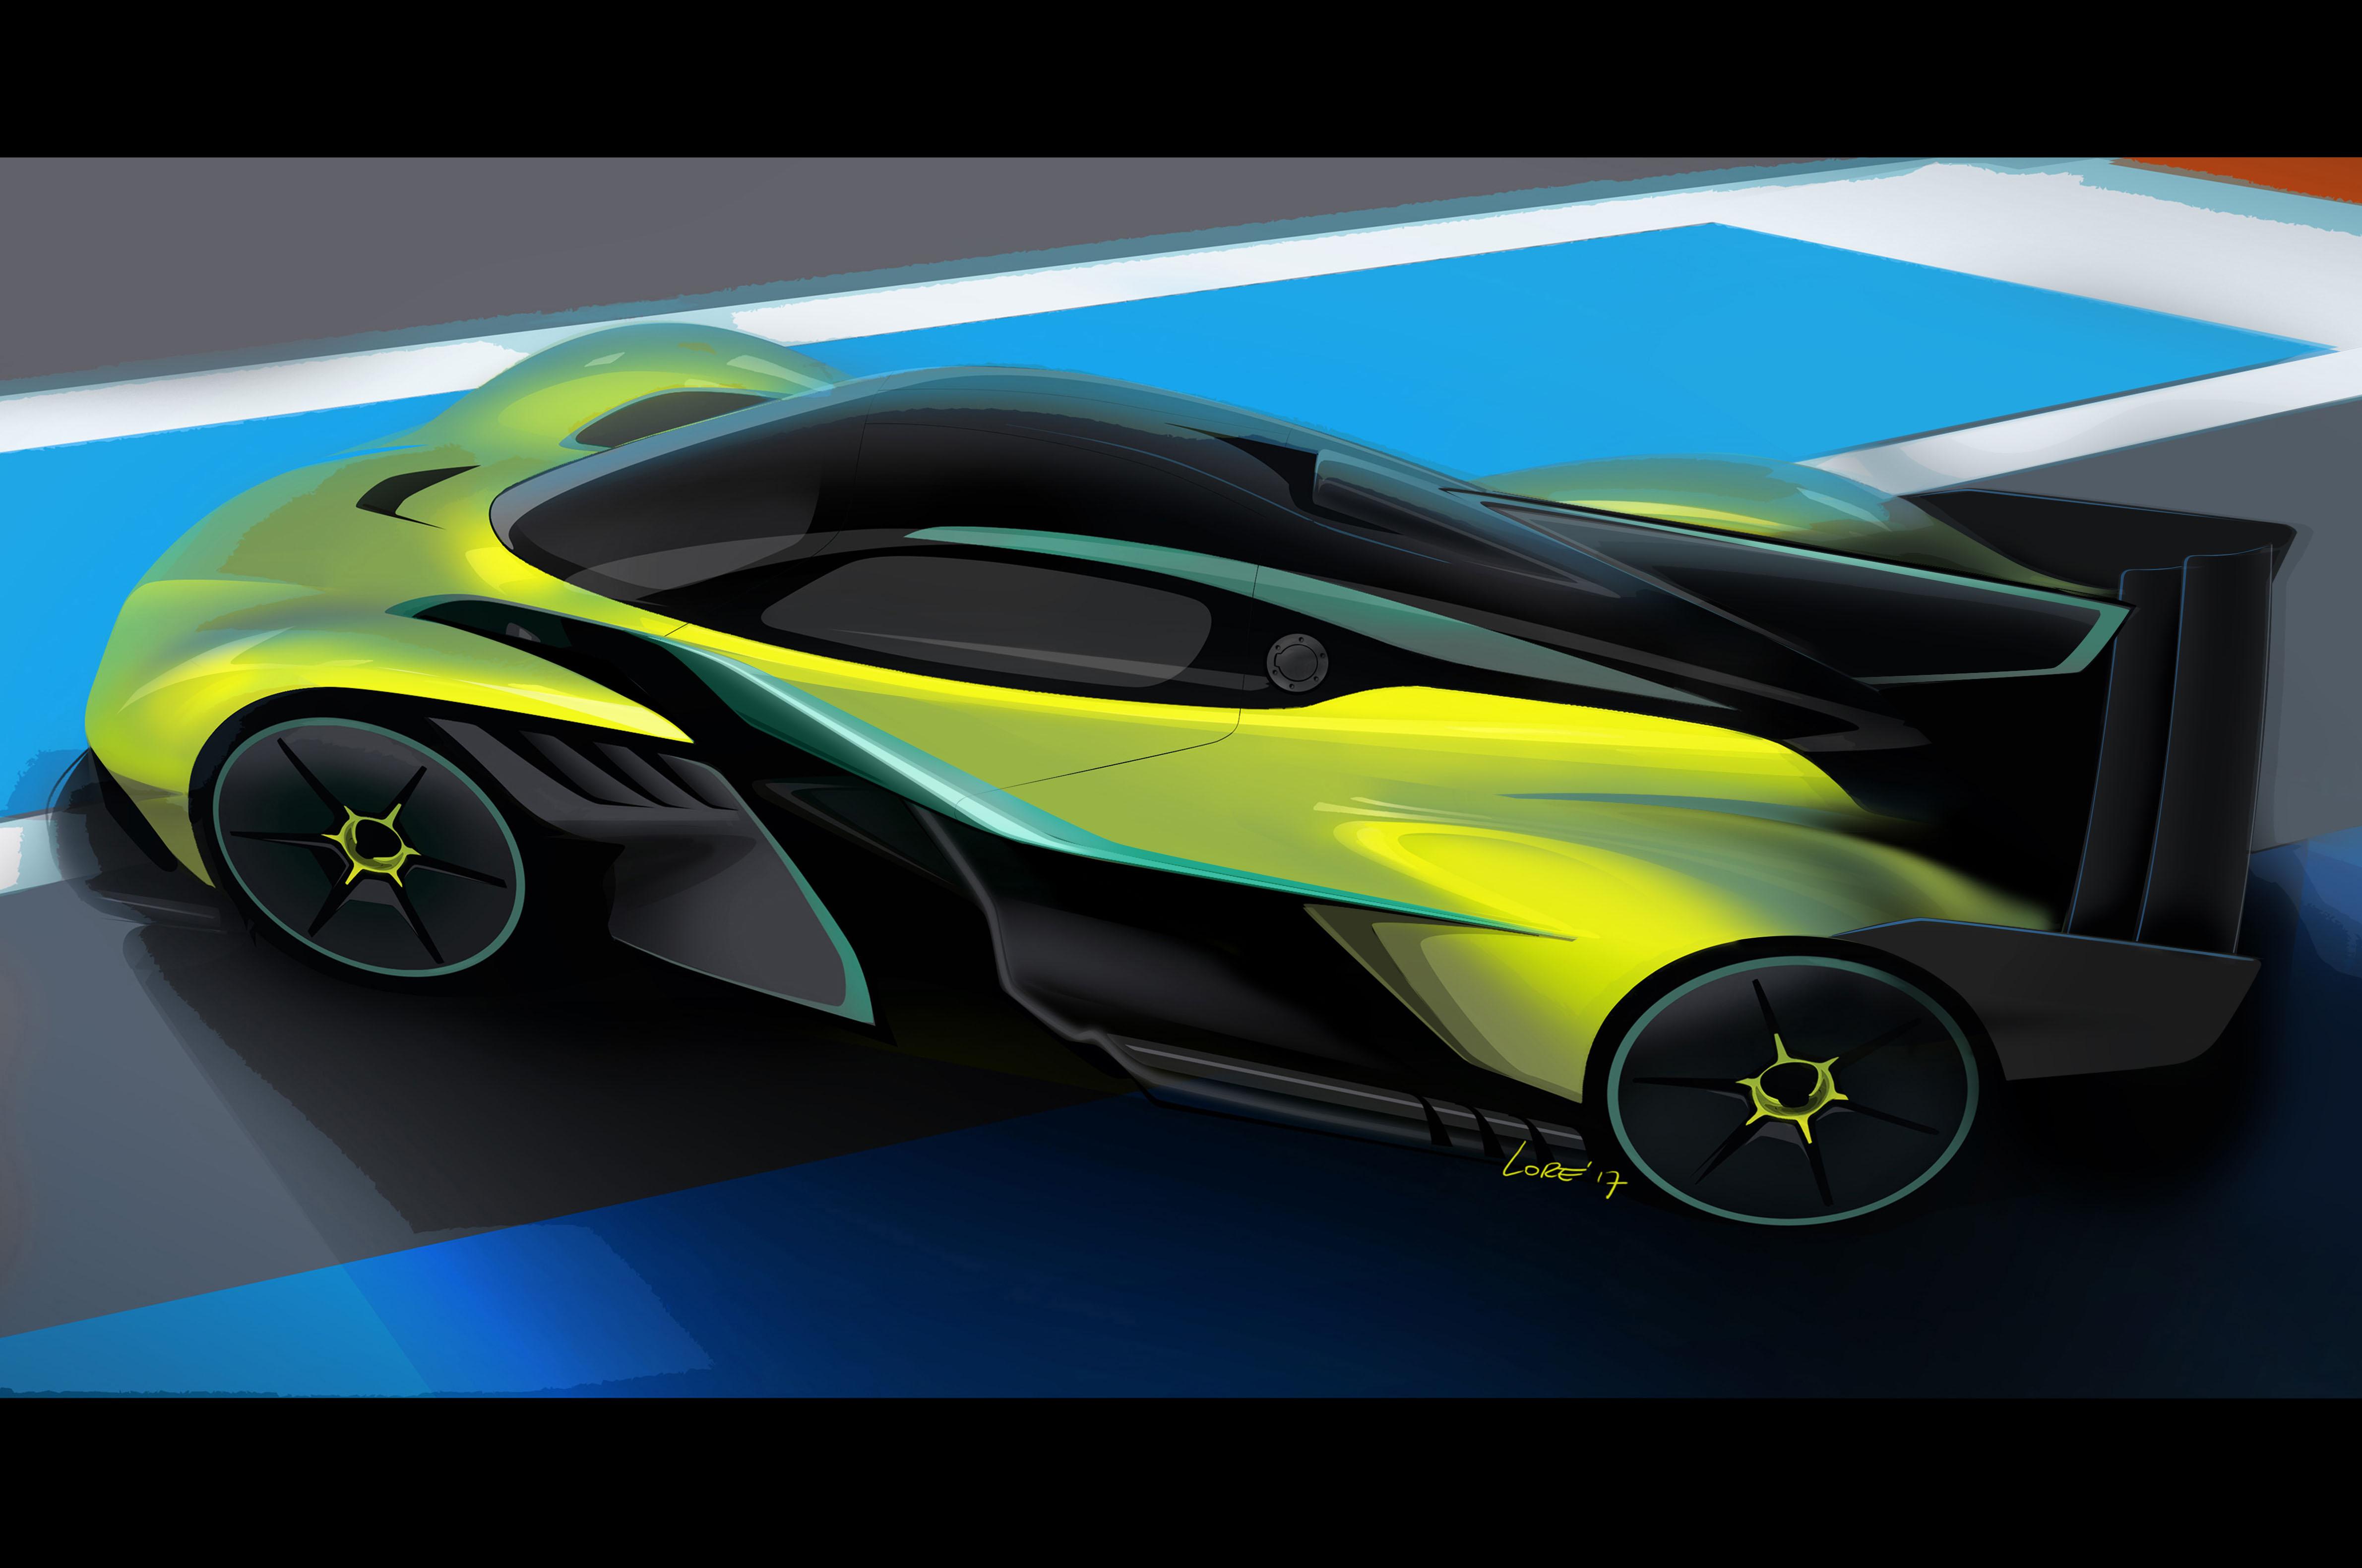 Aston Martin Valkyrie Amr Pro Achieves Top Speed Near 250 Mph